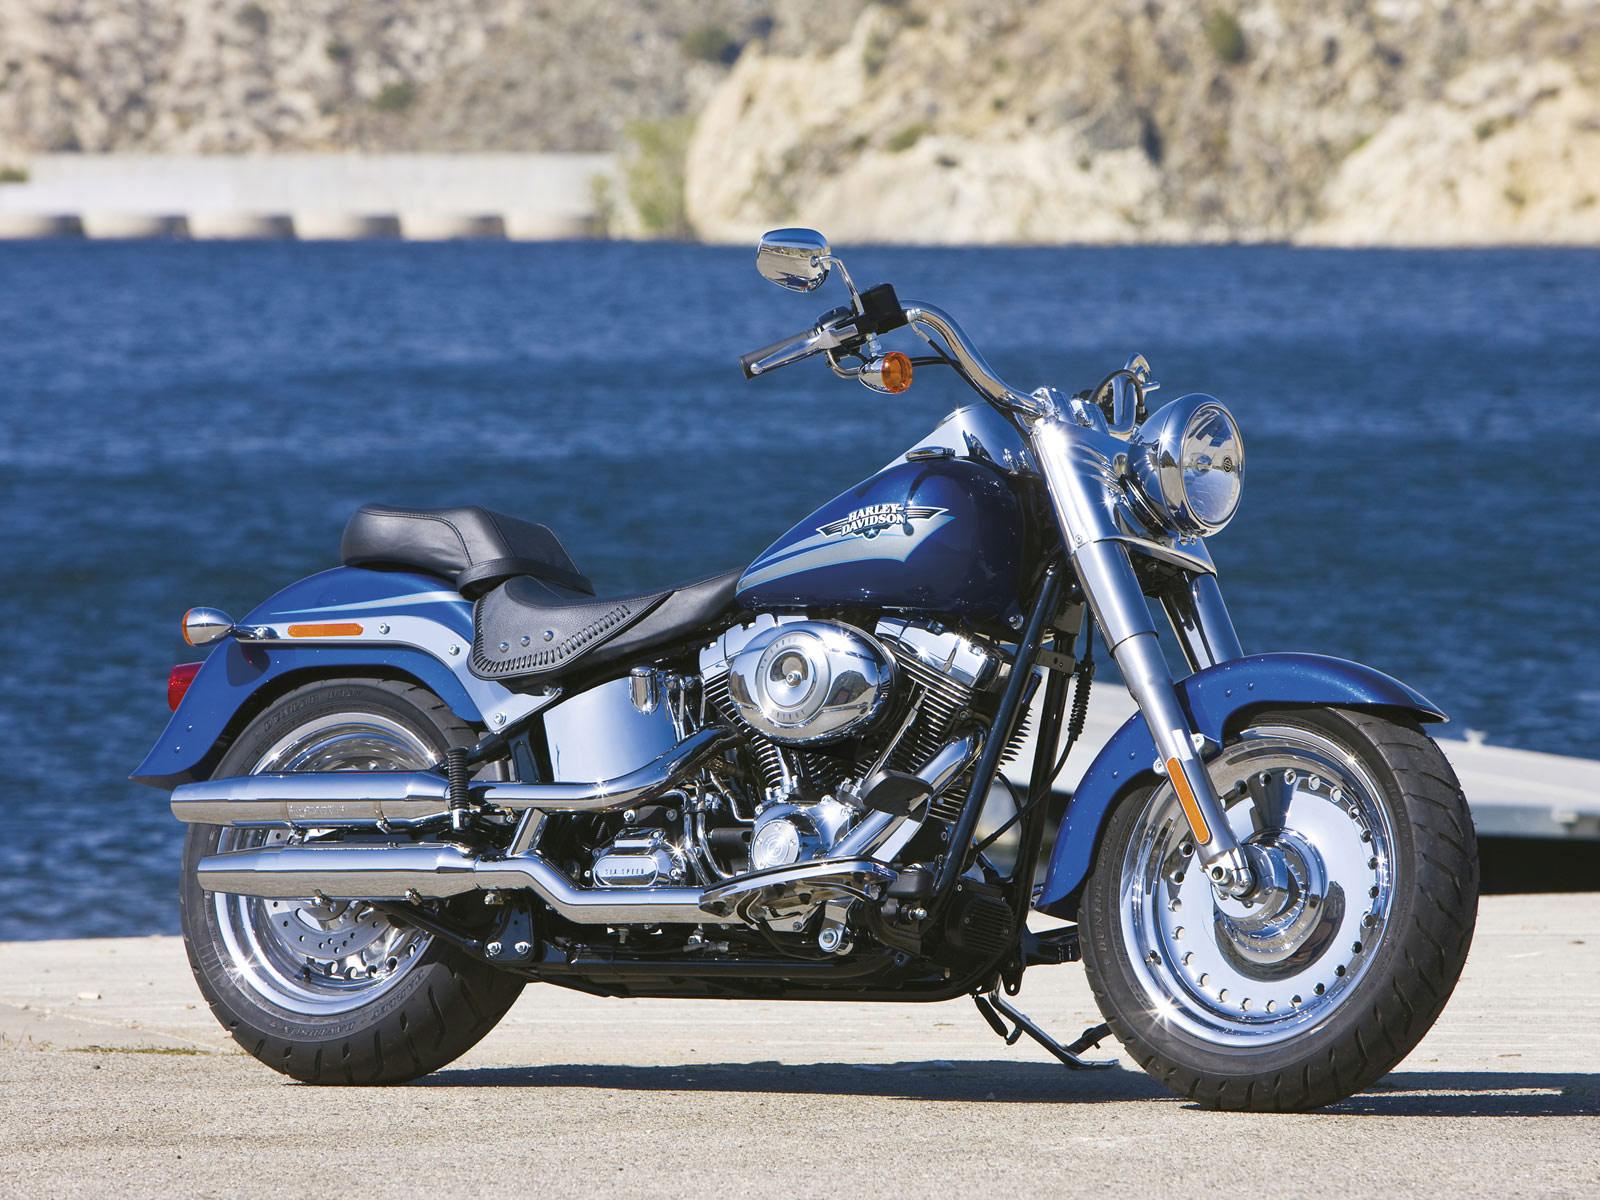 Accident lawyers info, 2009 Harley-Davidson FLSTF Fat Boy